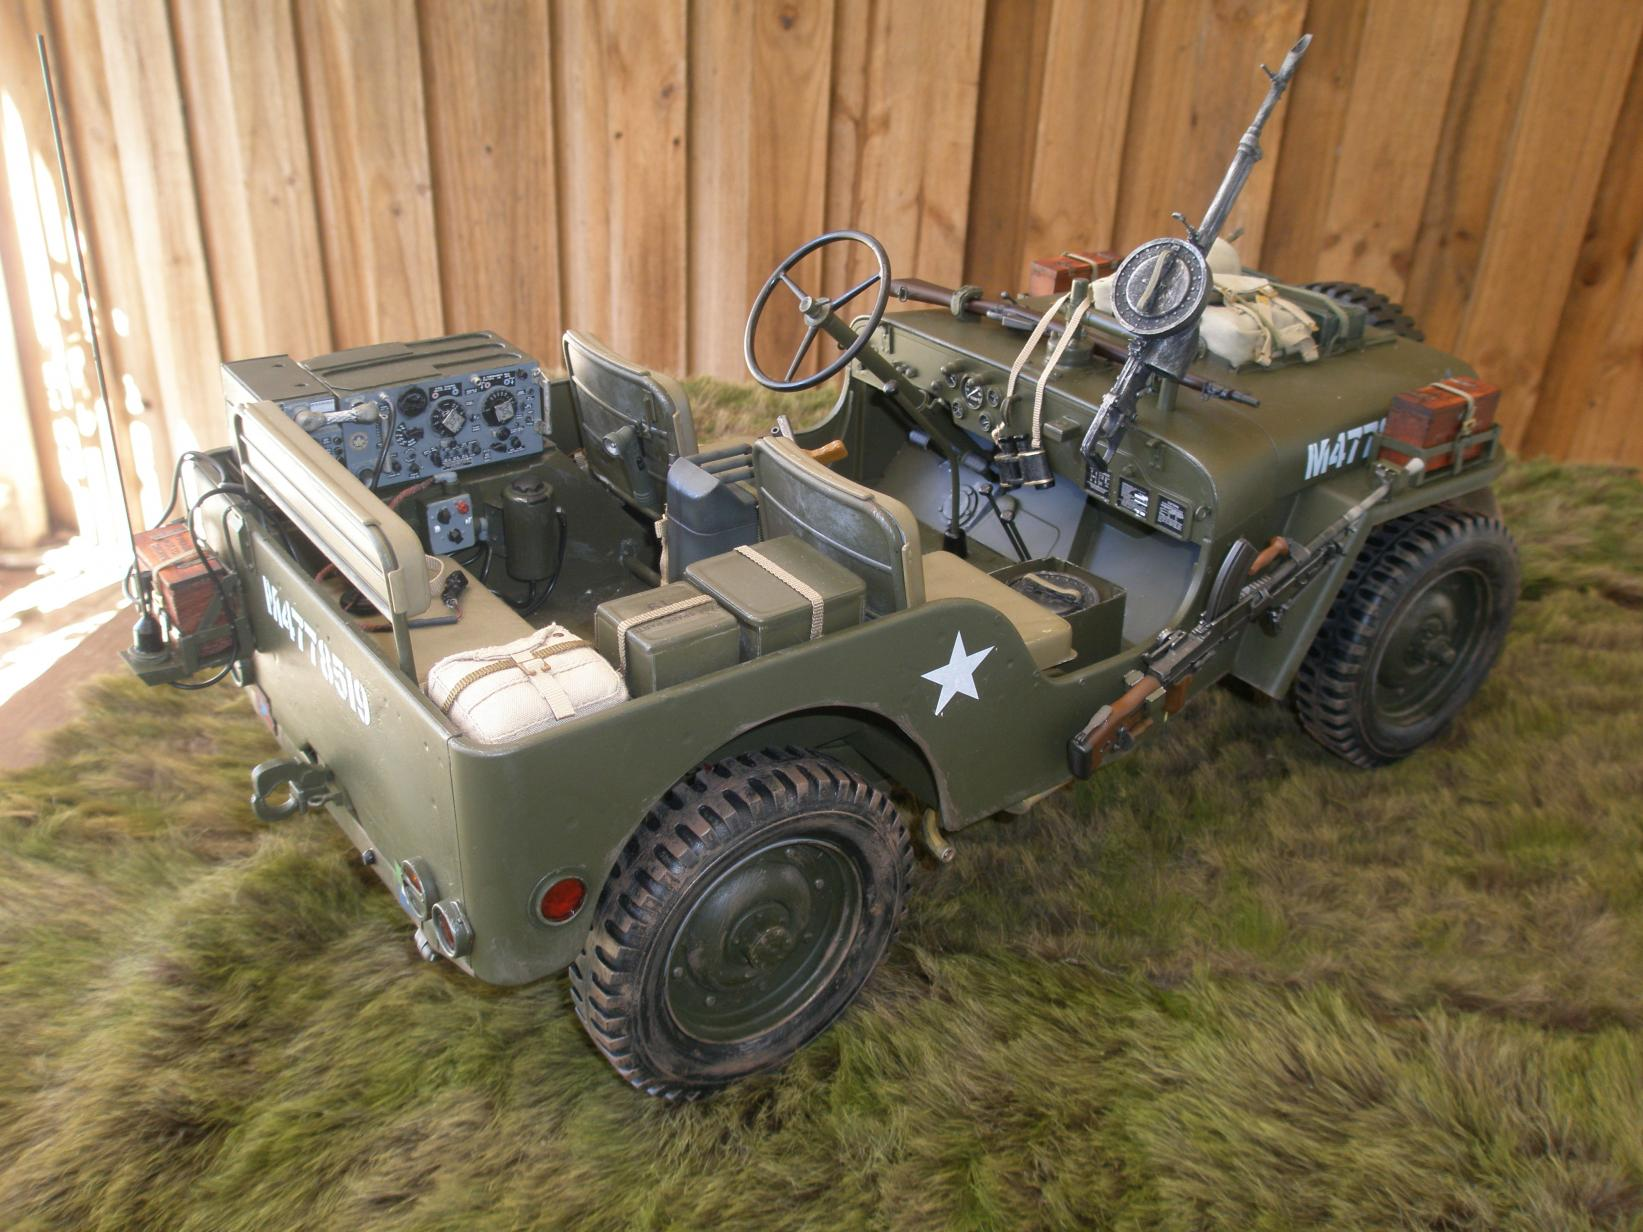 Used Jeeps Near Me >> British Airborne Jeeps - British Vehicles - HMVF ...